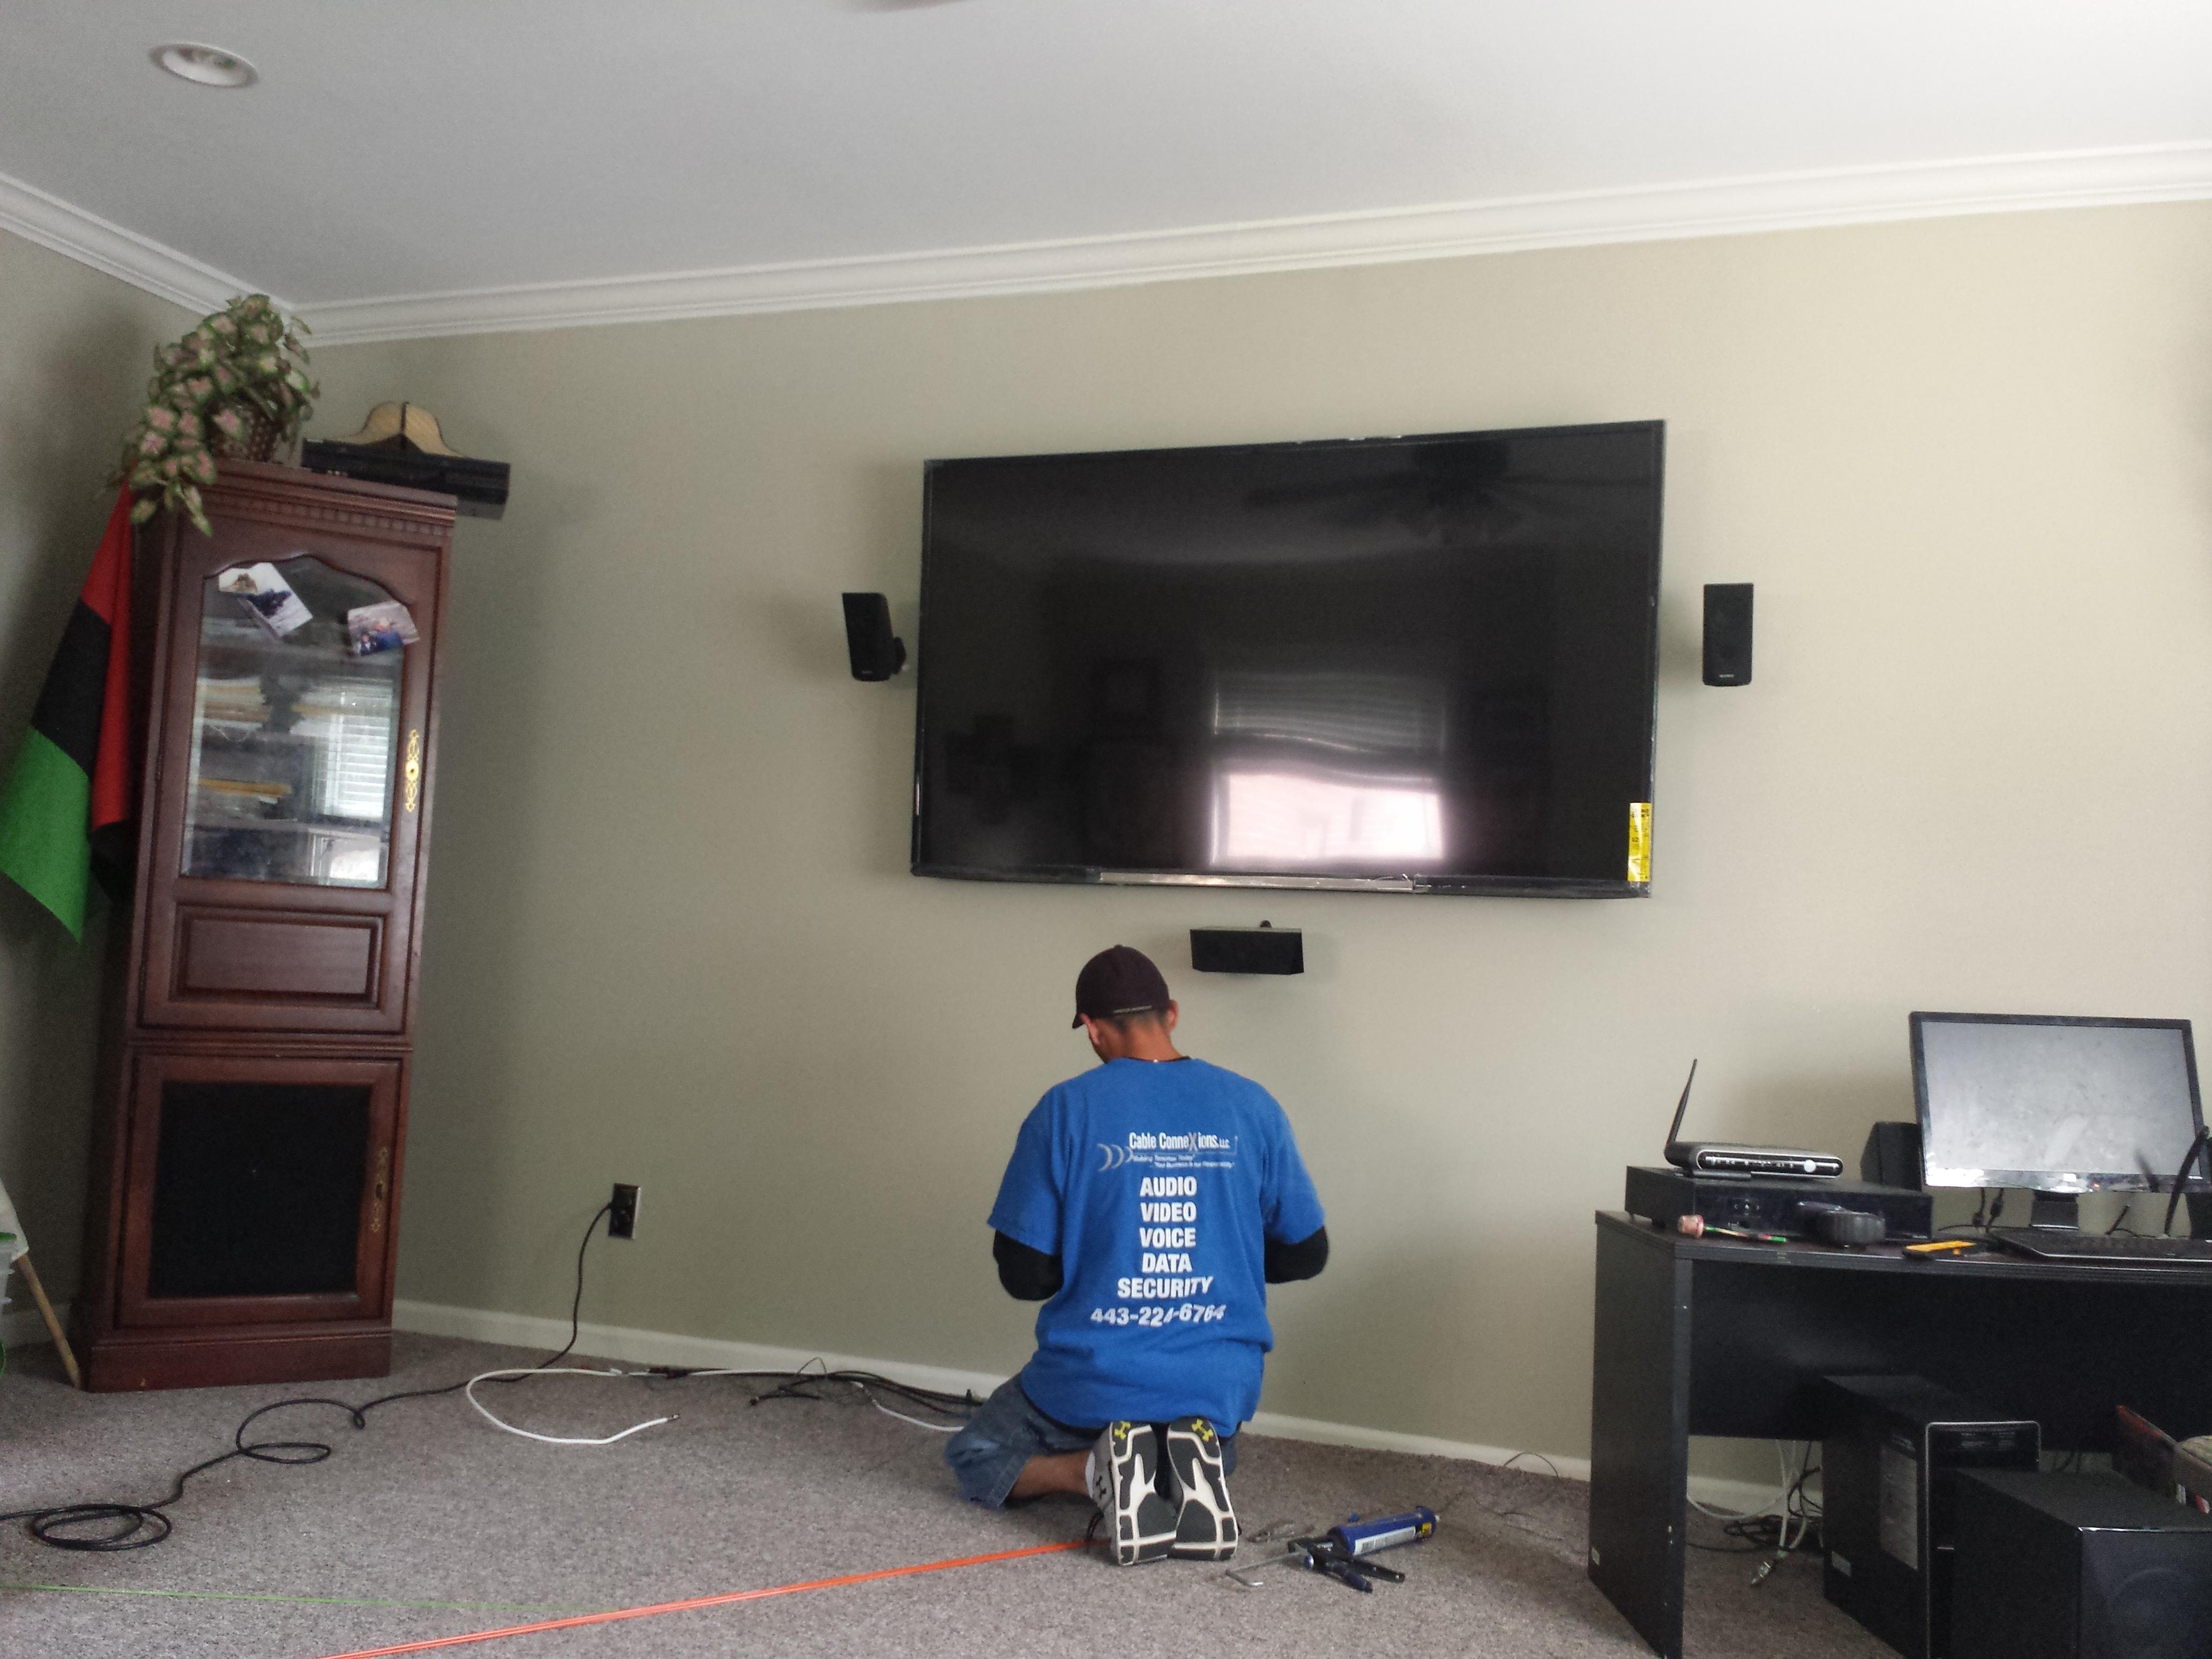 Cable ConneXions